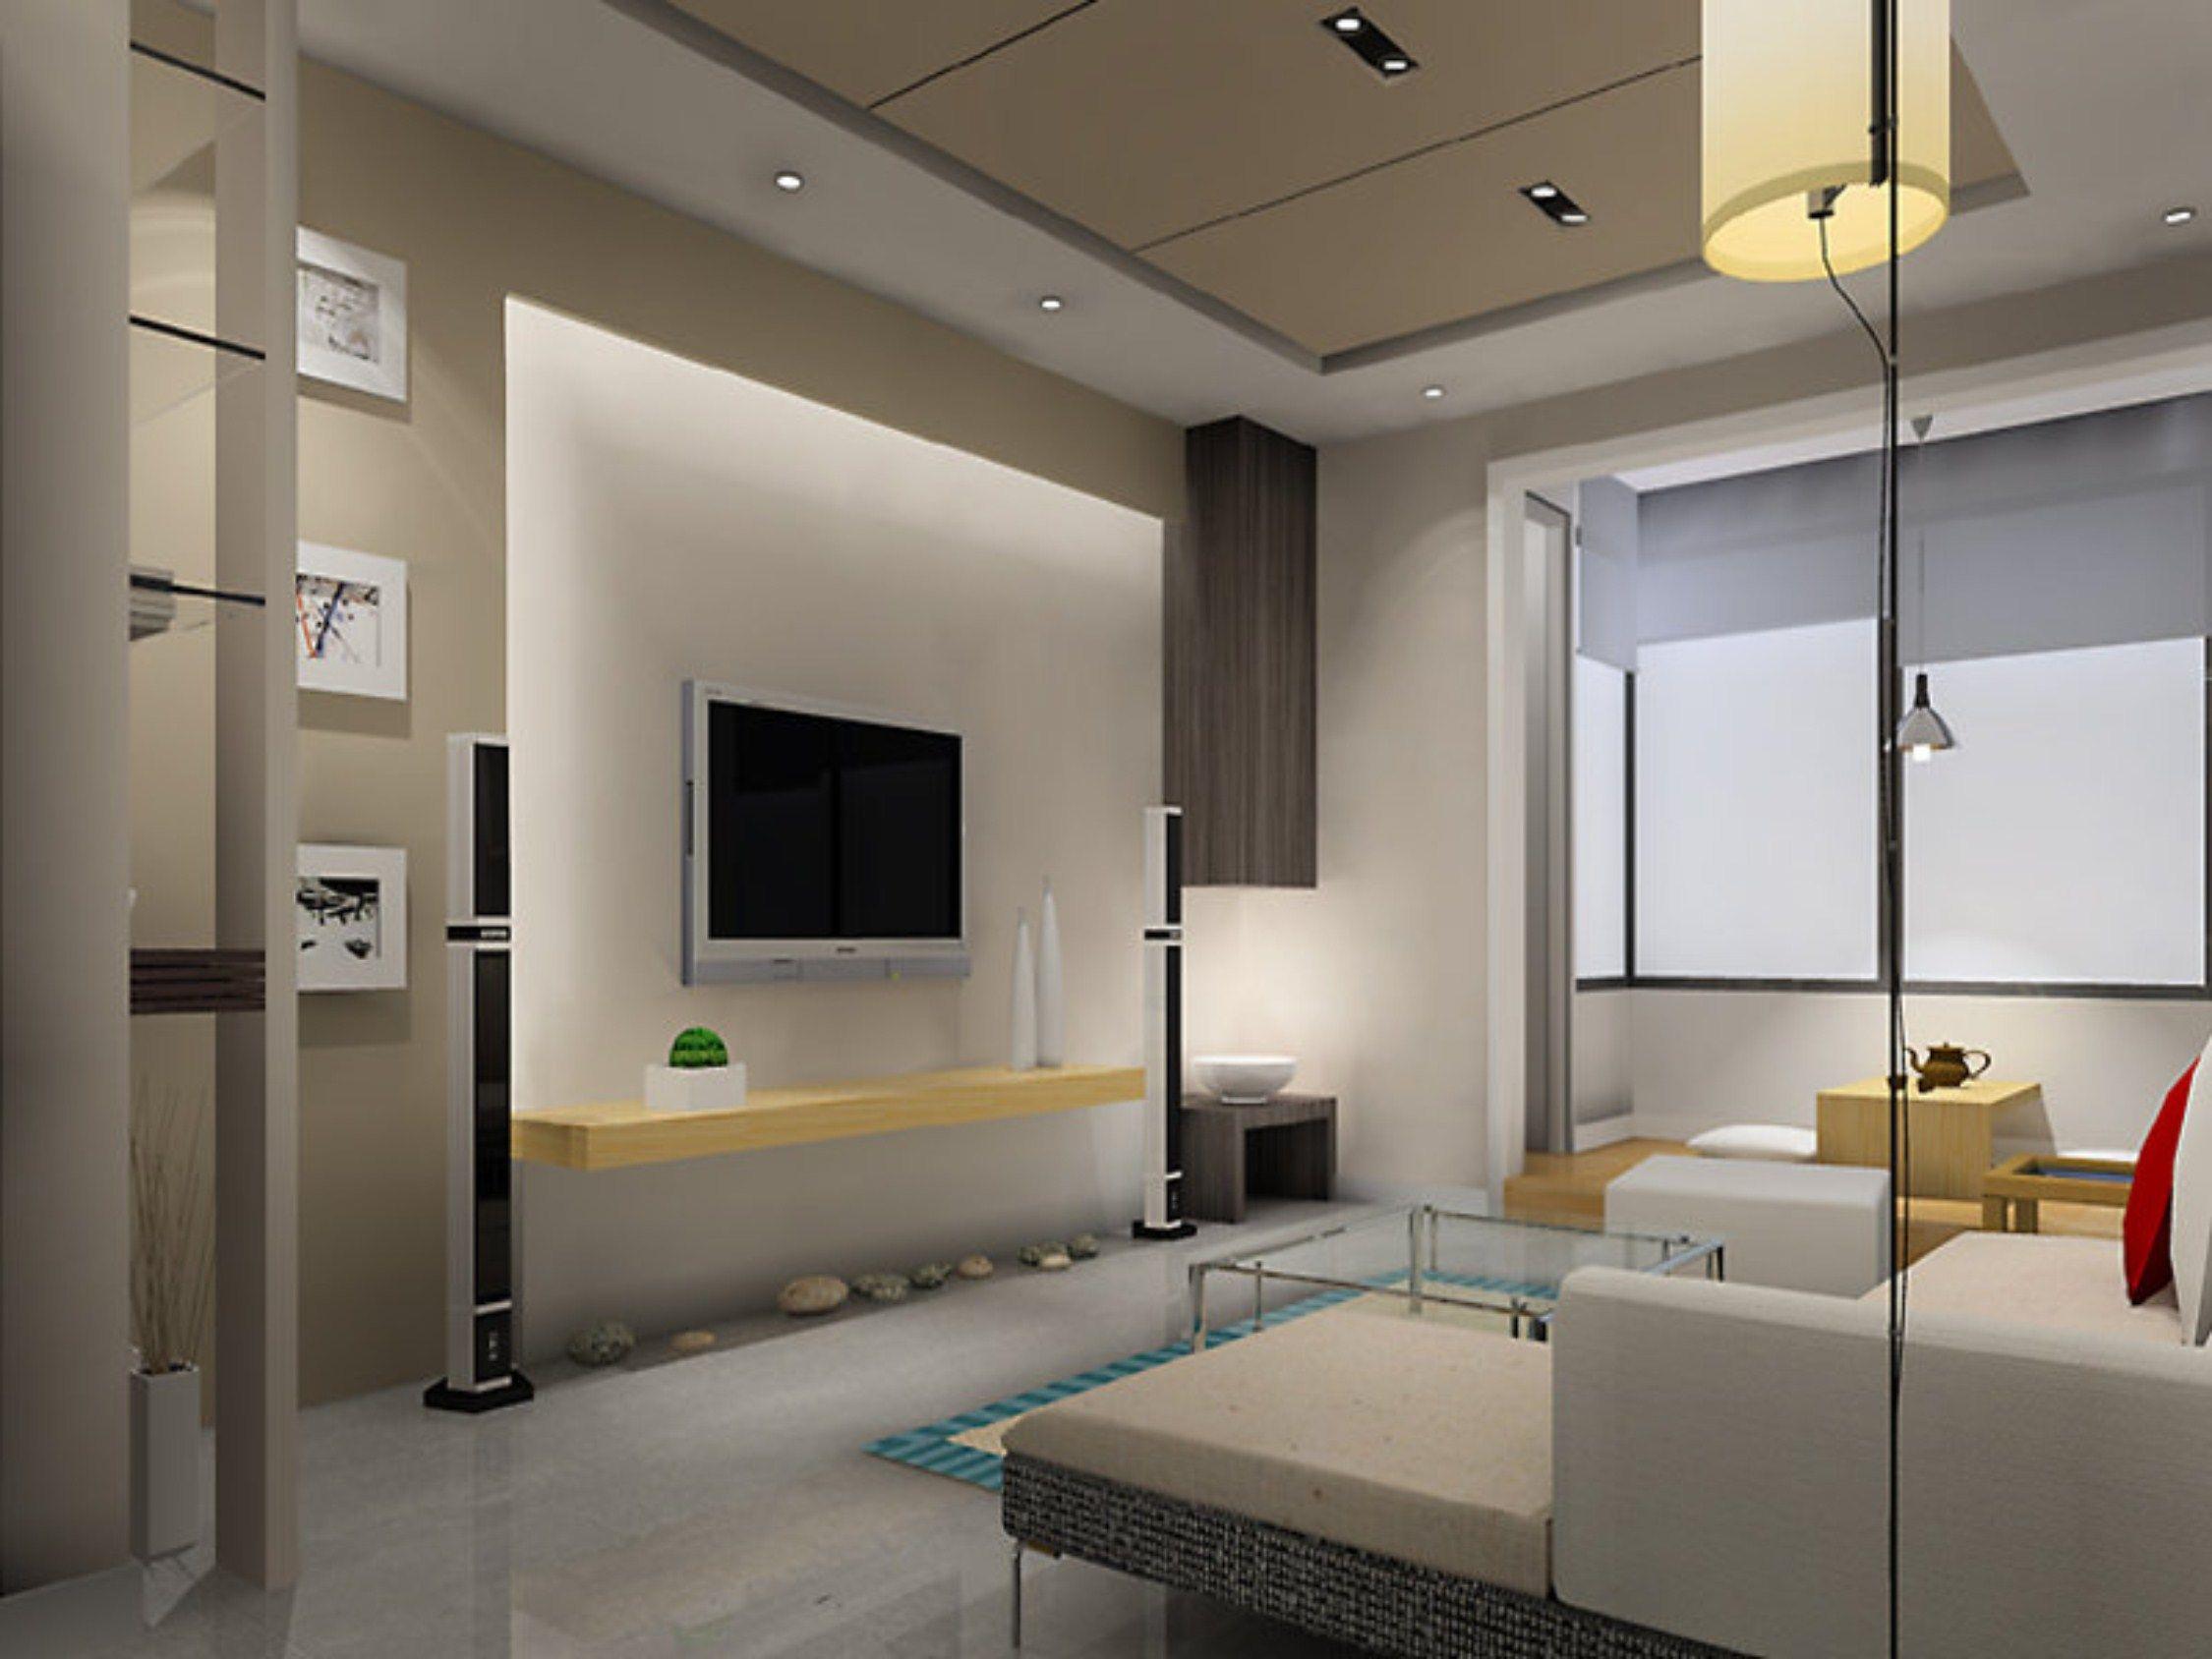 Minimalist Ultra Modern House Plans Design Modern House Condo Interior Design Modern Houses Interior Contemporary House Interior Design